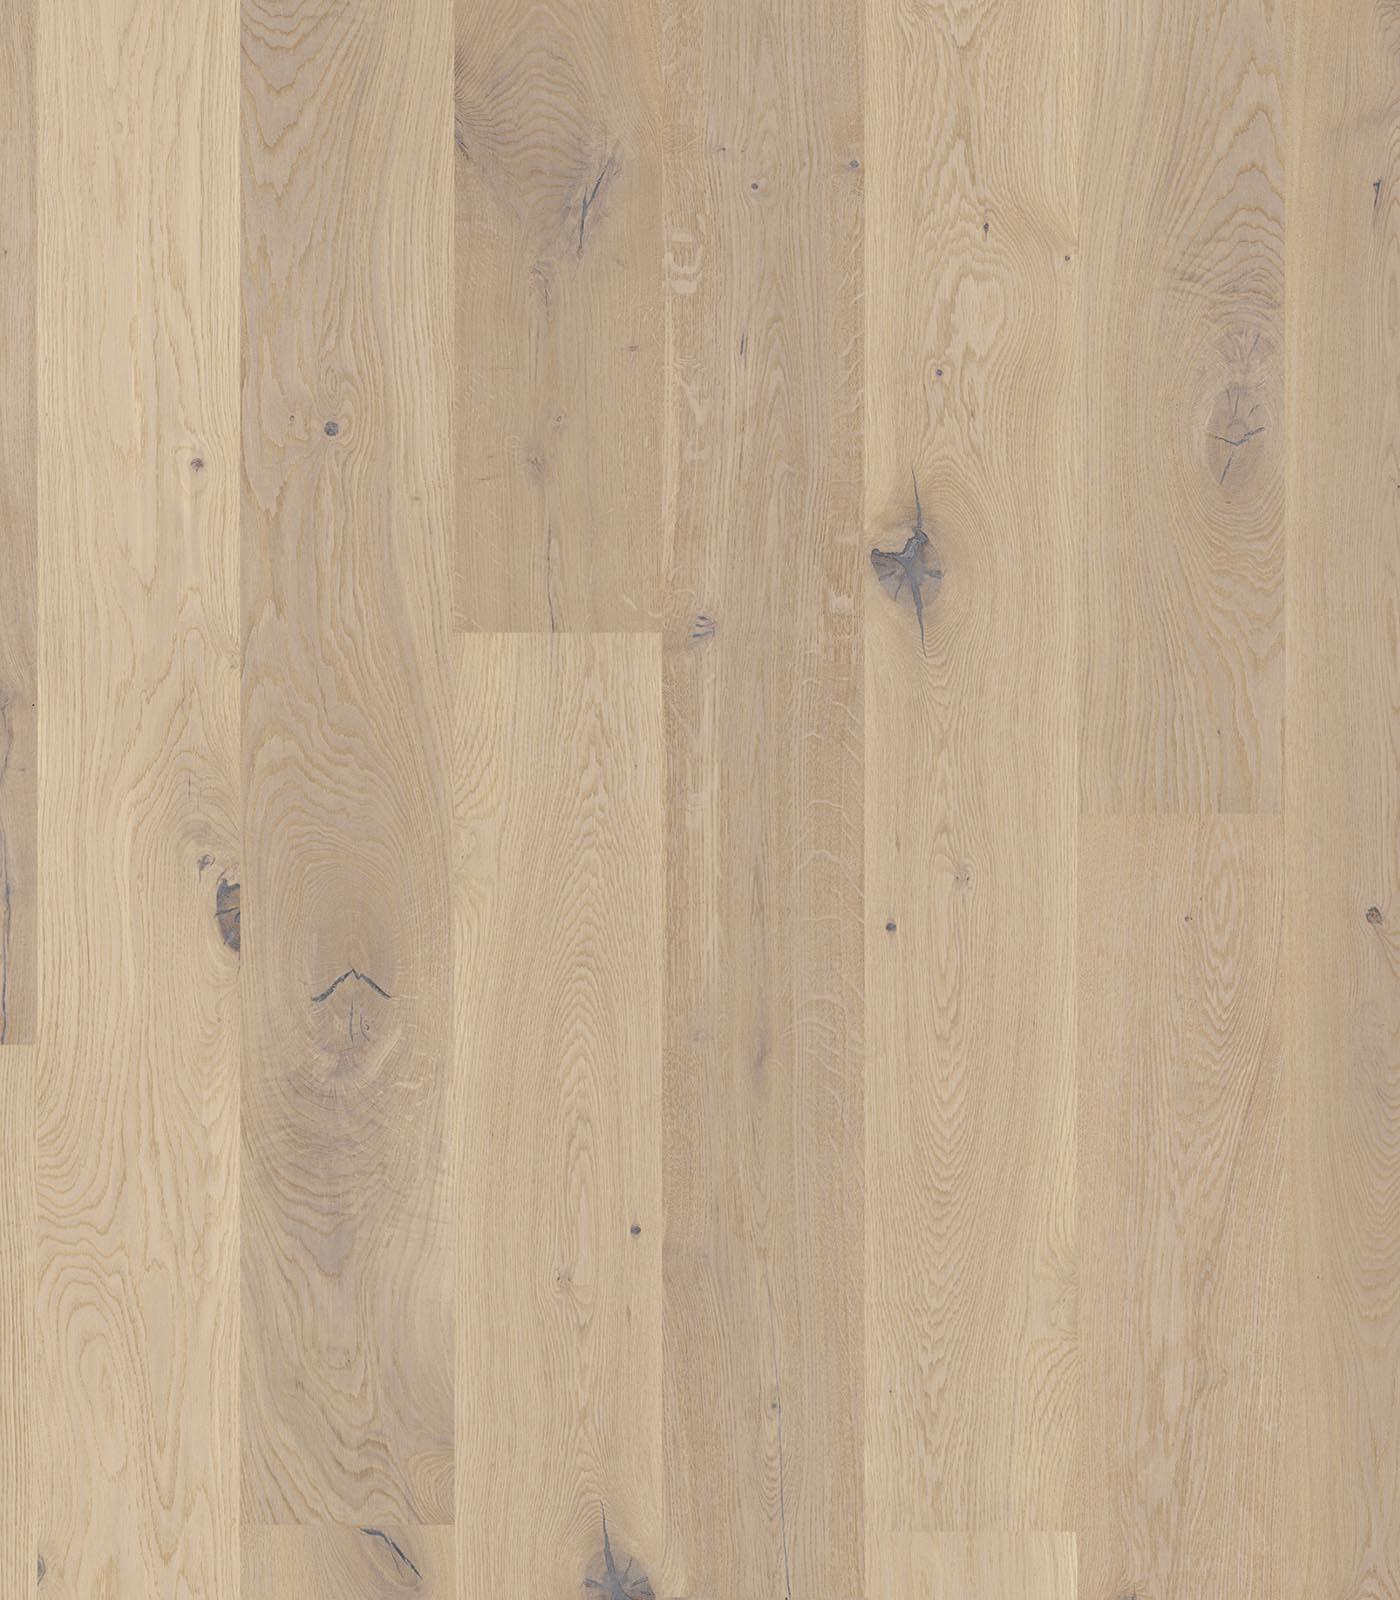 Andes-engineered European Oak Flooring